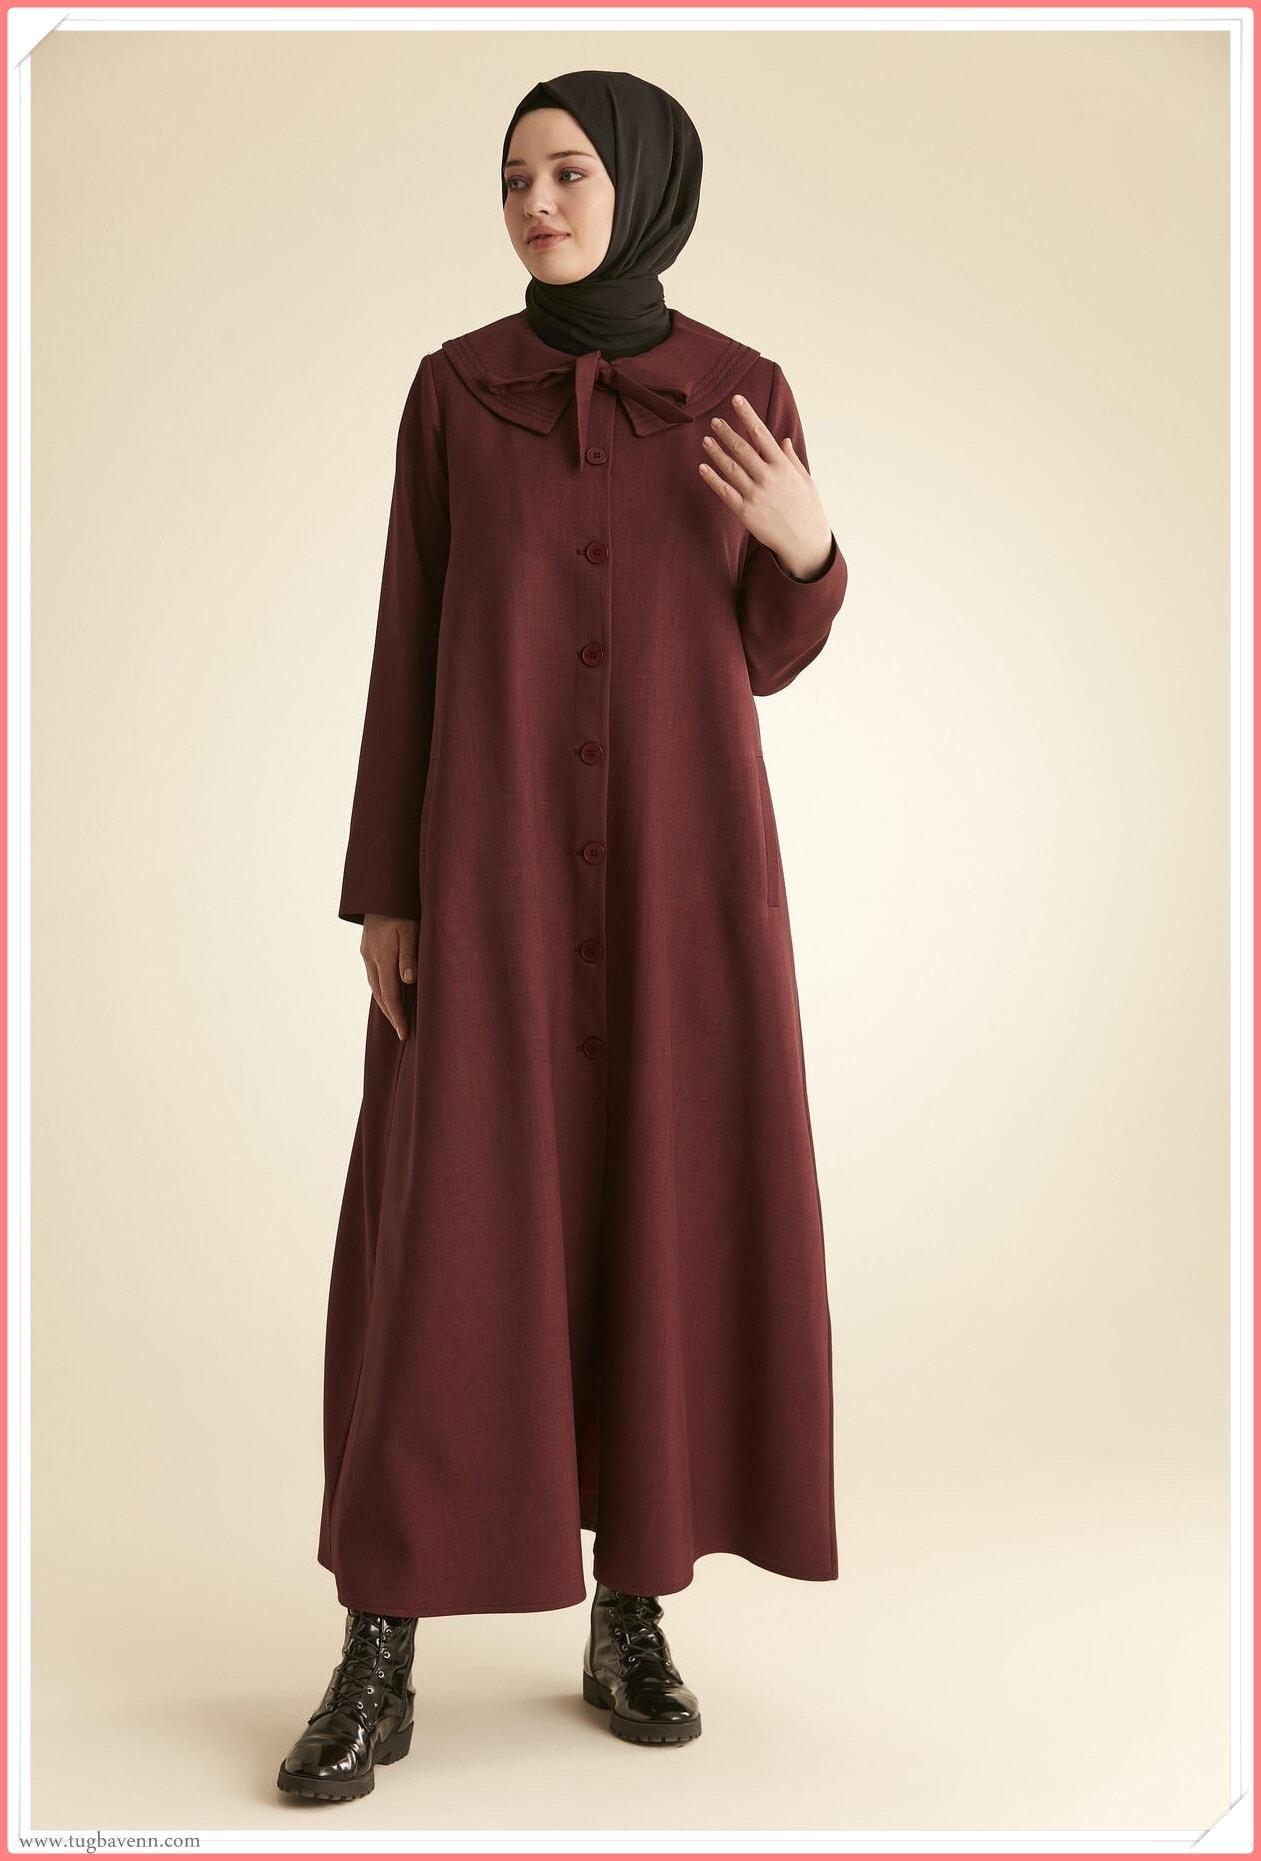 tugba pardesü 2021,pardesü modelleri 2021,tesettür giyim pardesüler 2021,tuğba pardesü 2021,tuğba pardesü 2021 kolekisyonu,hijab fashion,hijab style,pardesüler 2021